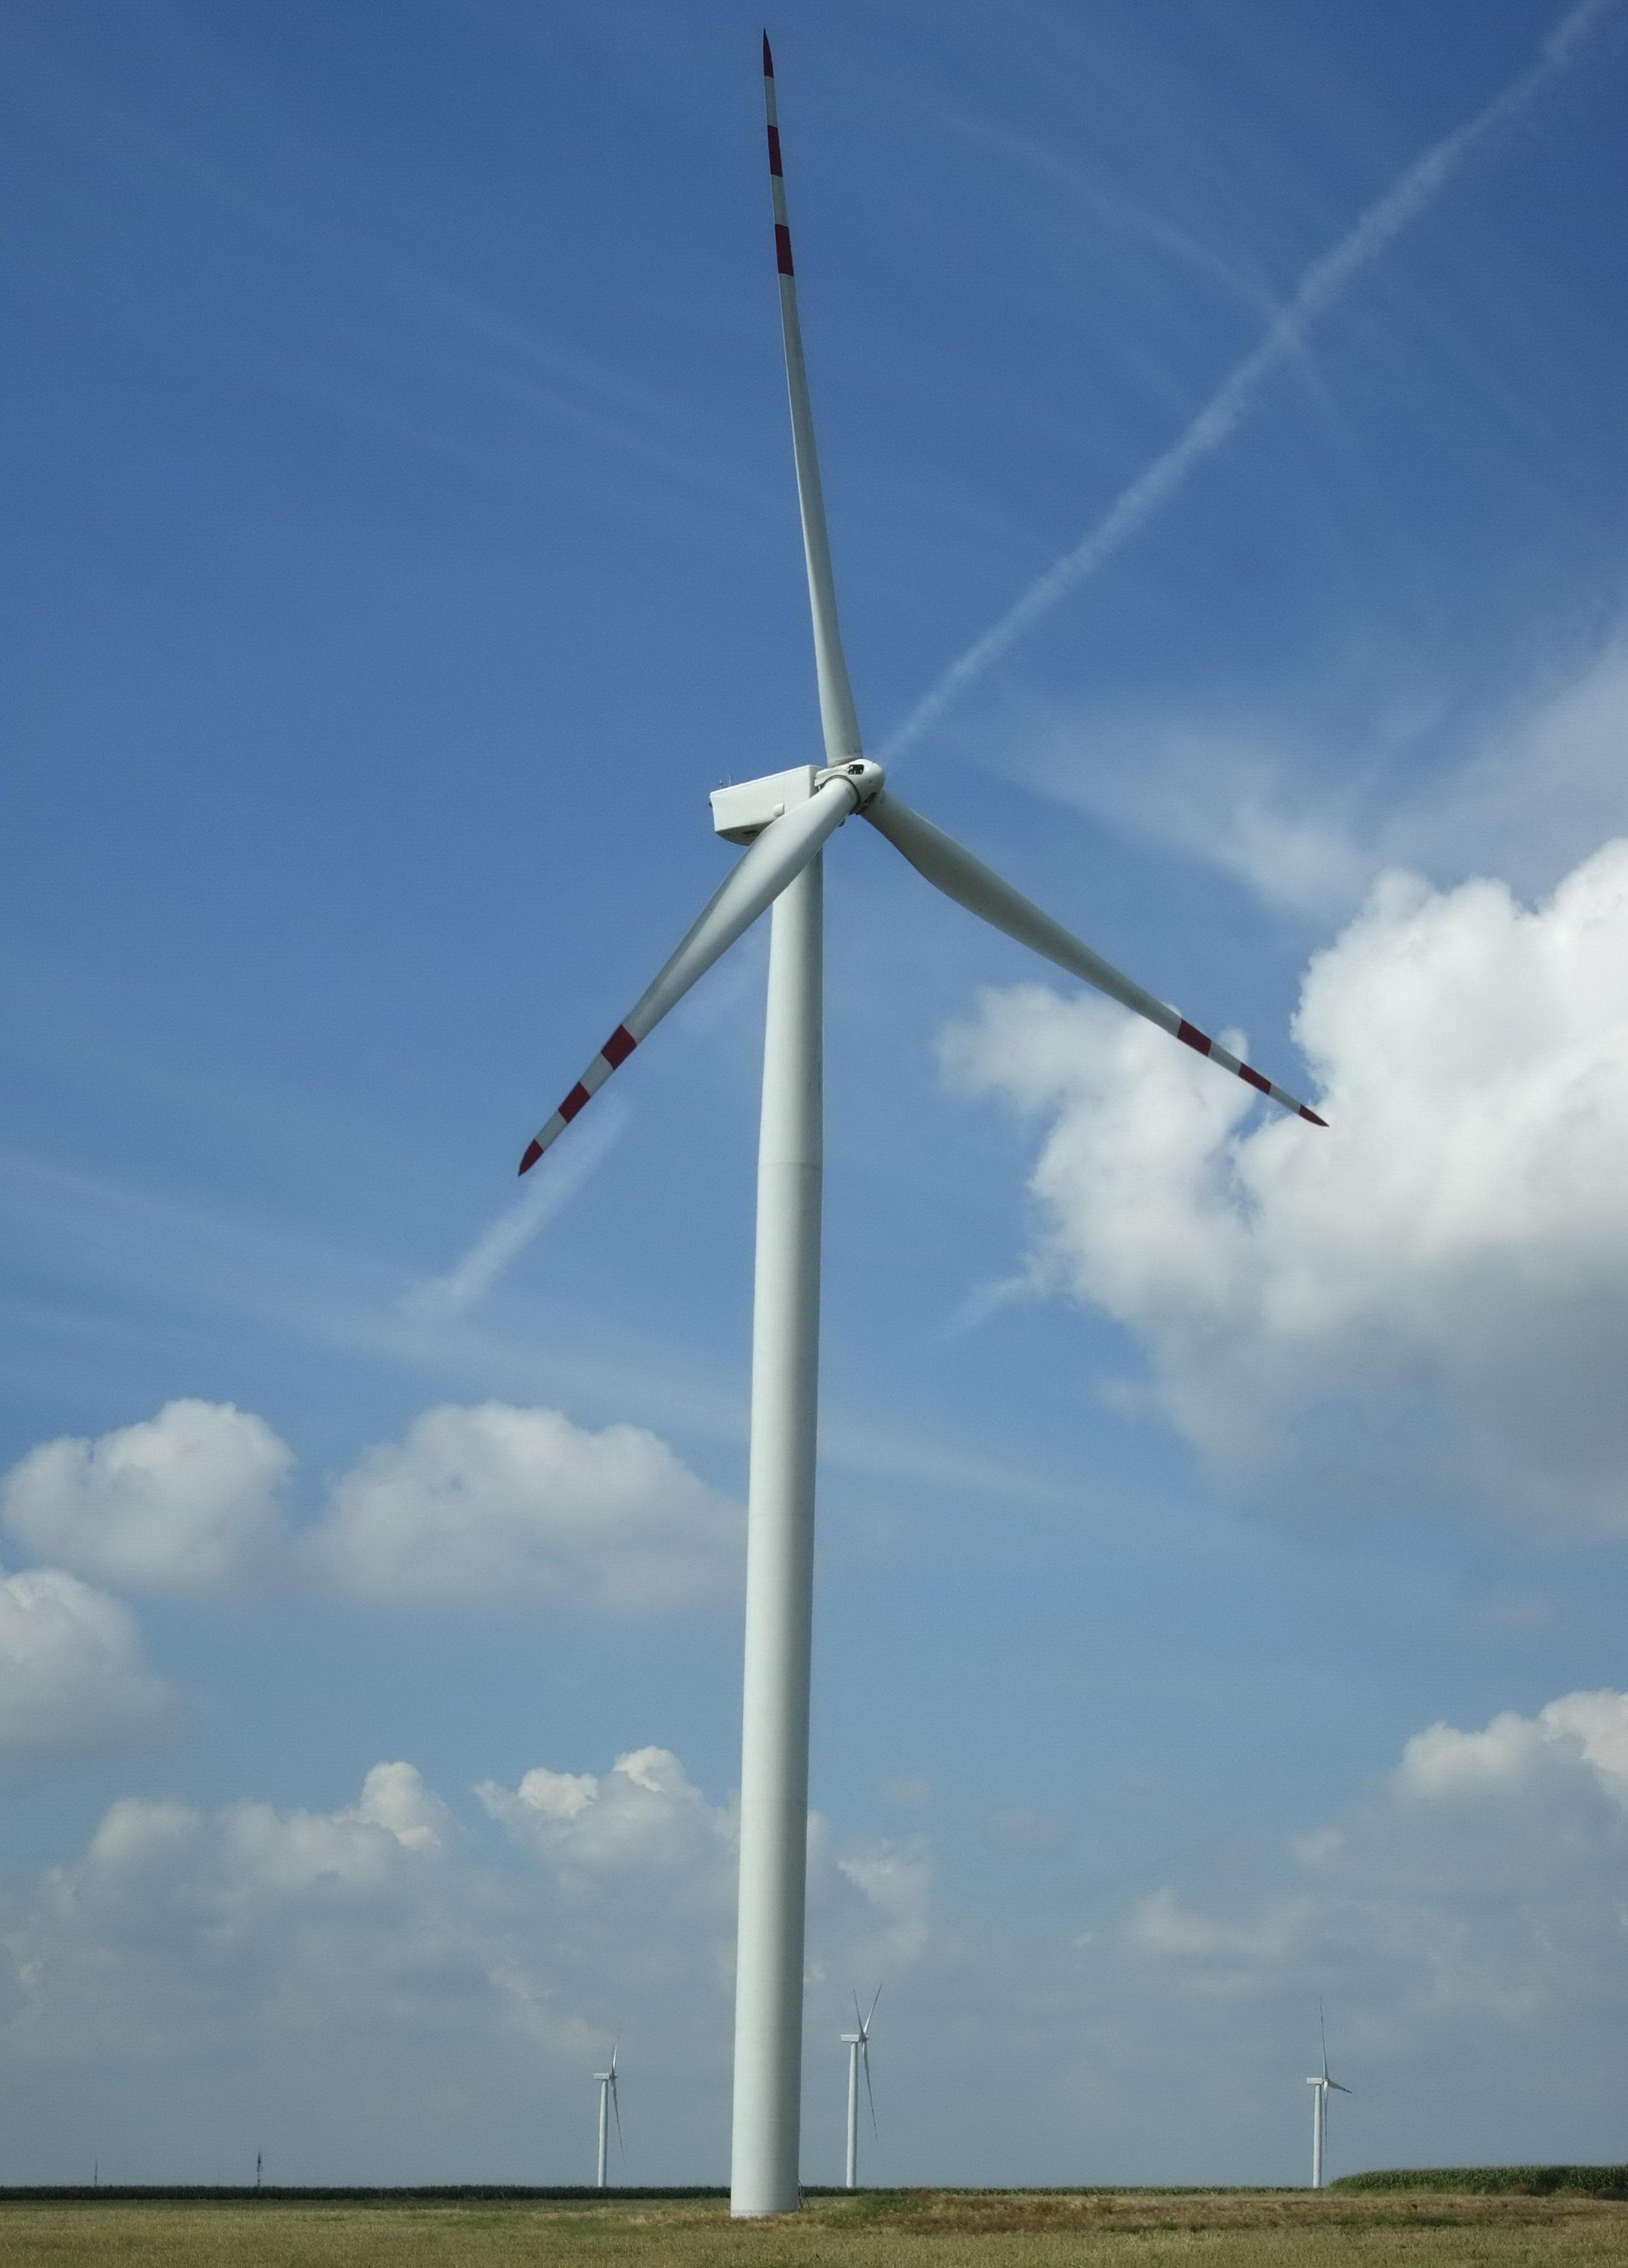 Free landscape field rural mast machine wind turbine